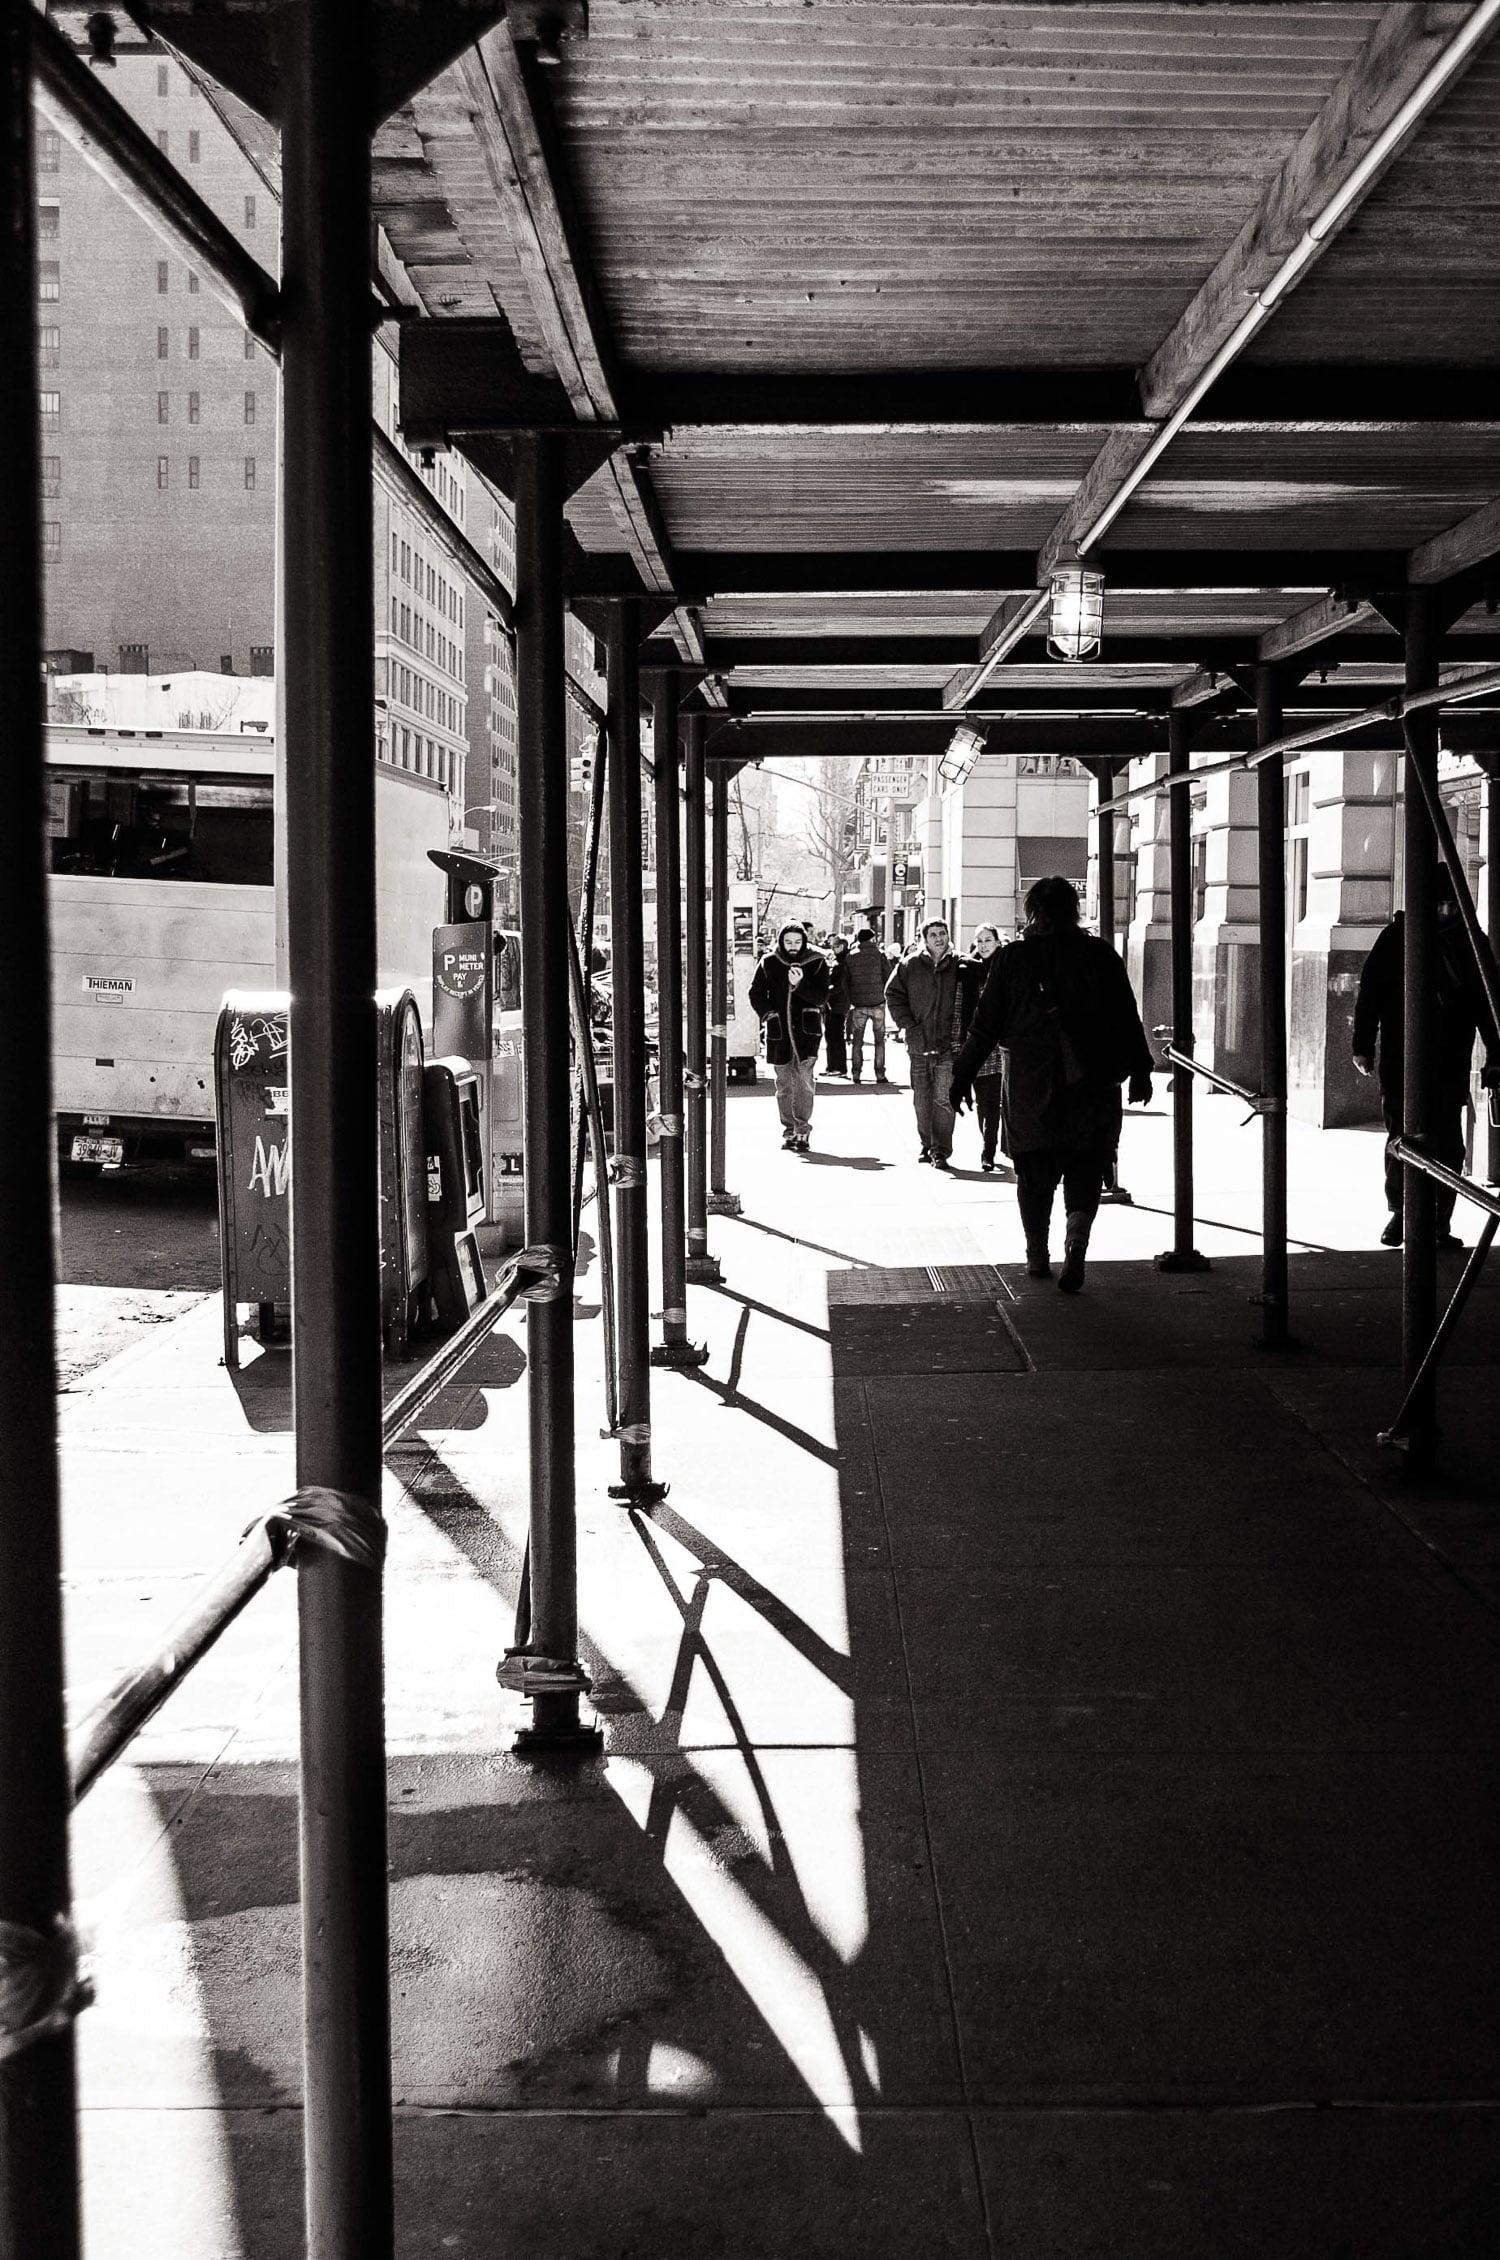 patricia-vanrespaille-photography-life-through-my-lens-005.jpg